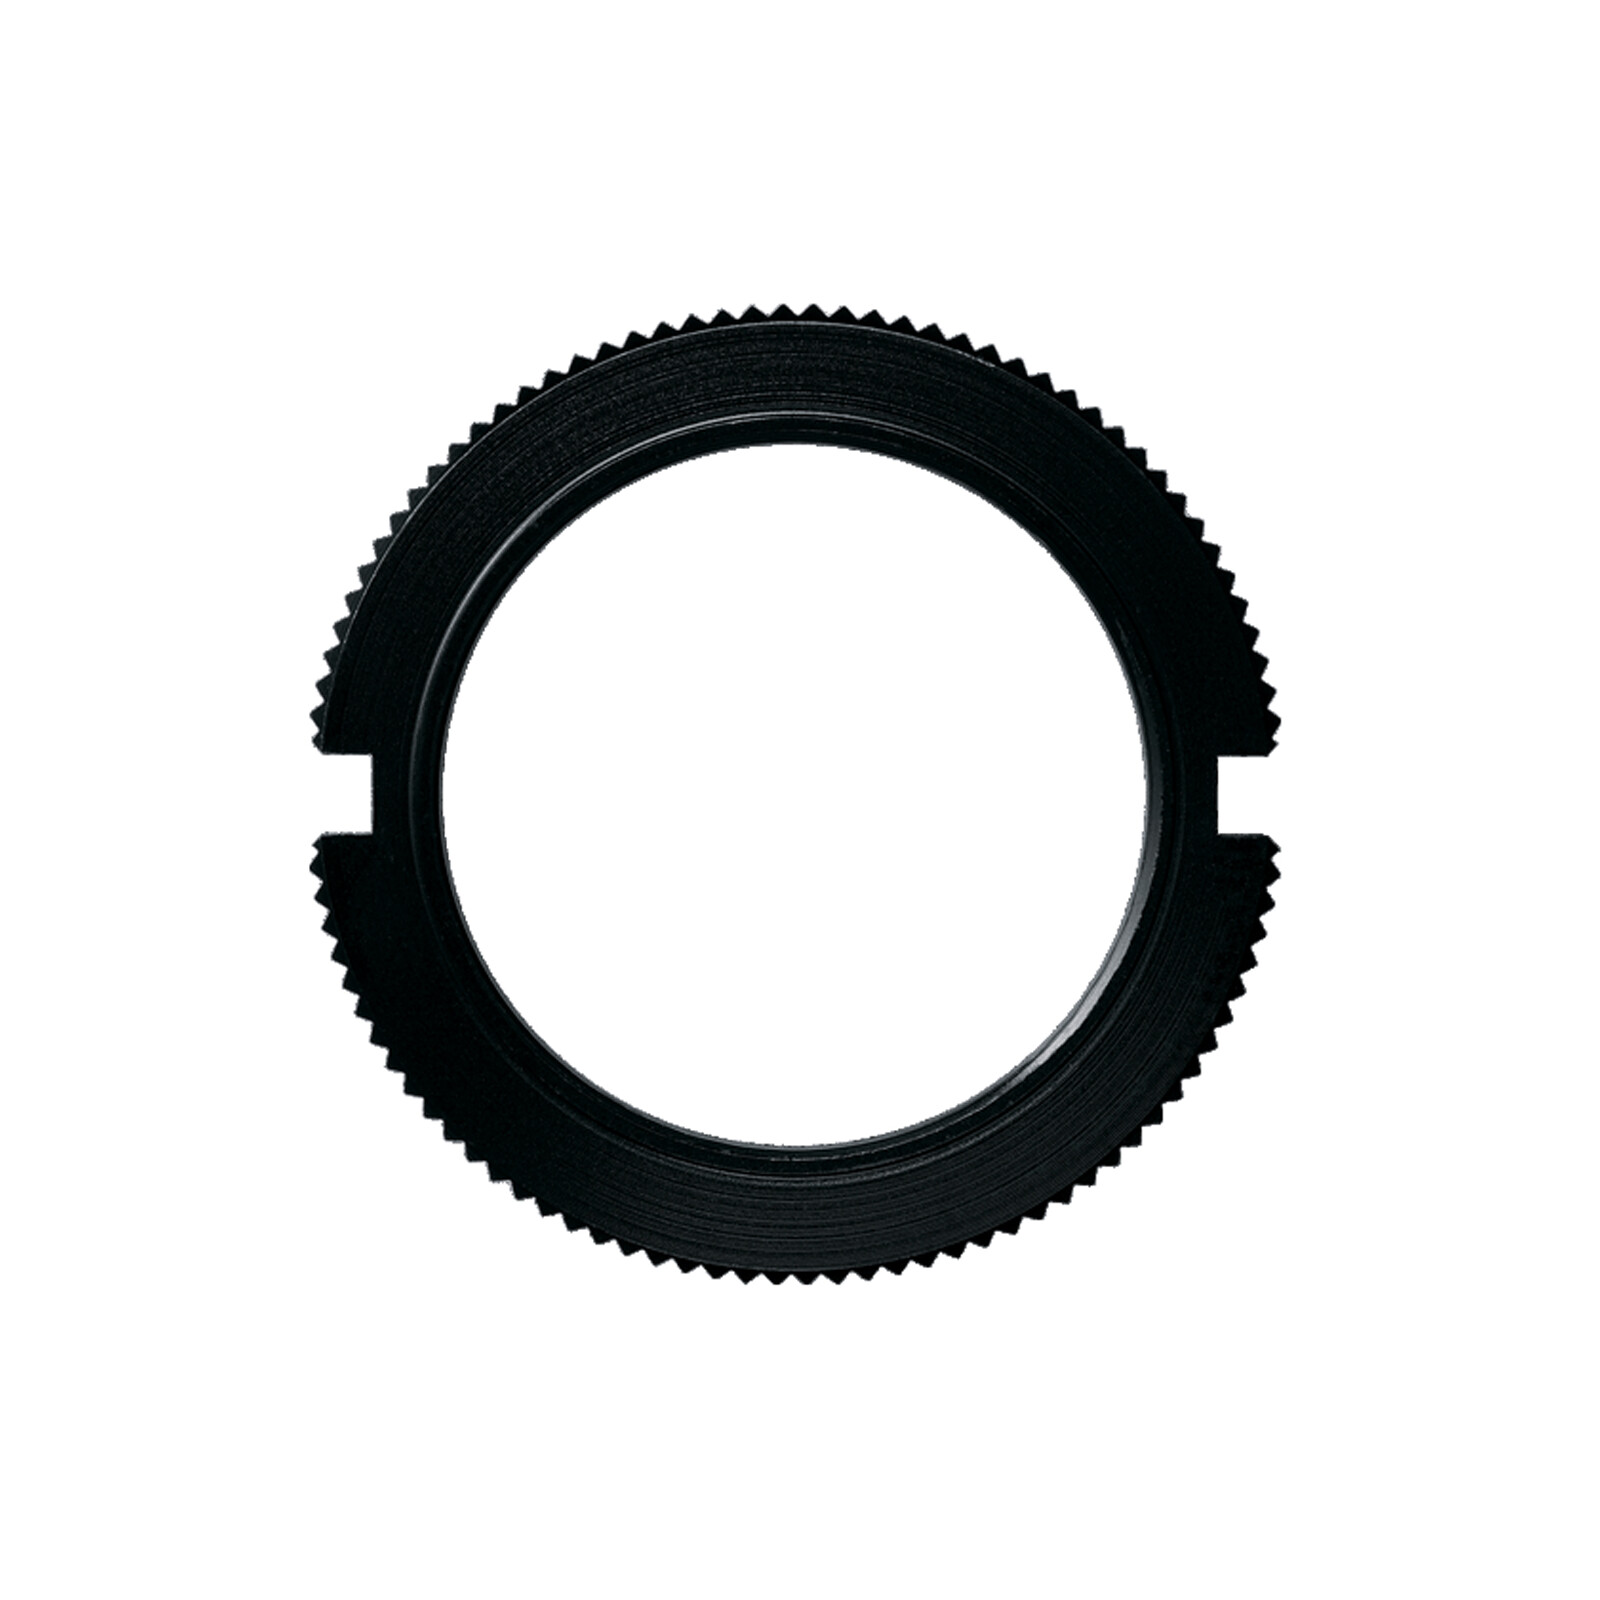 Nikon DK-18 Okularadapter